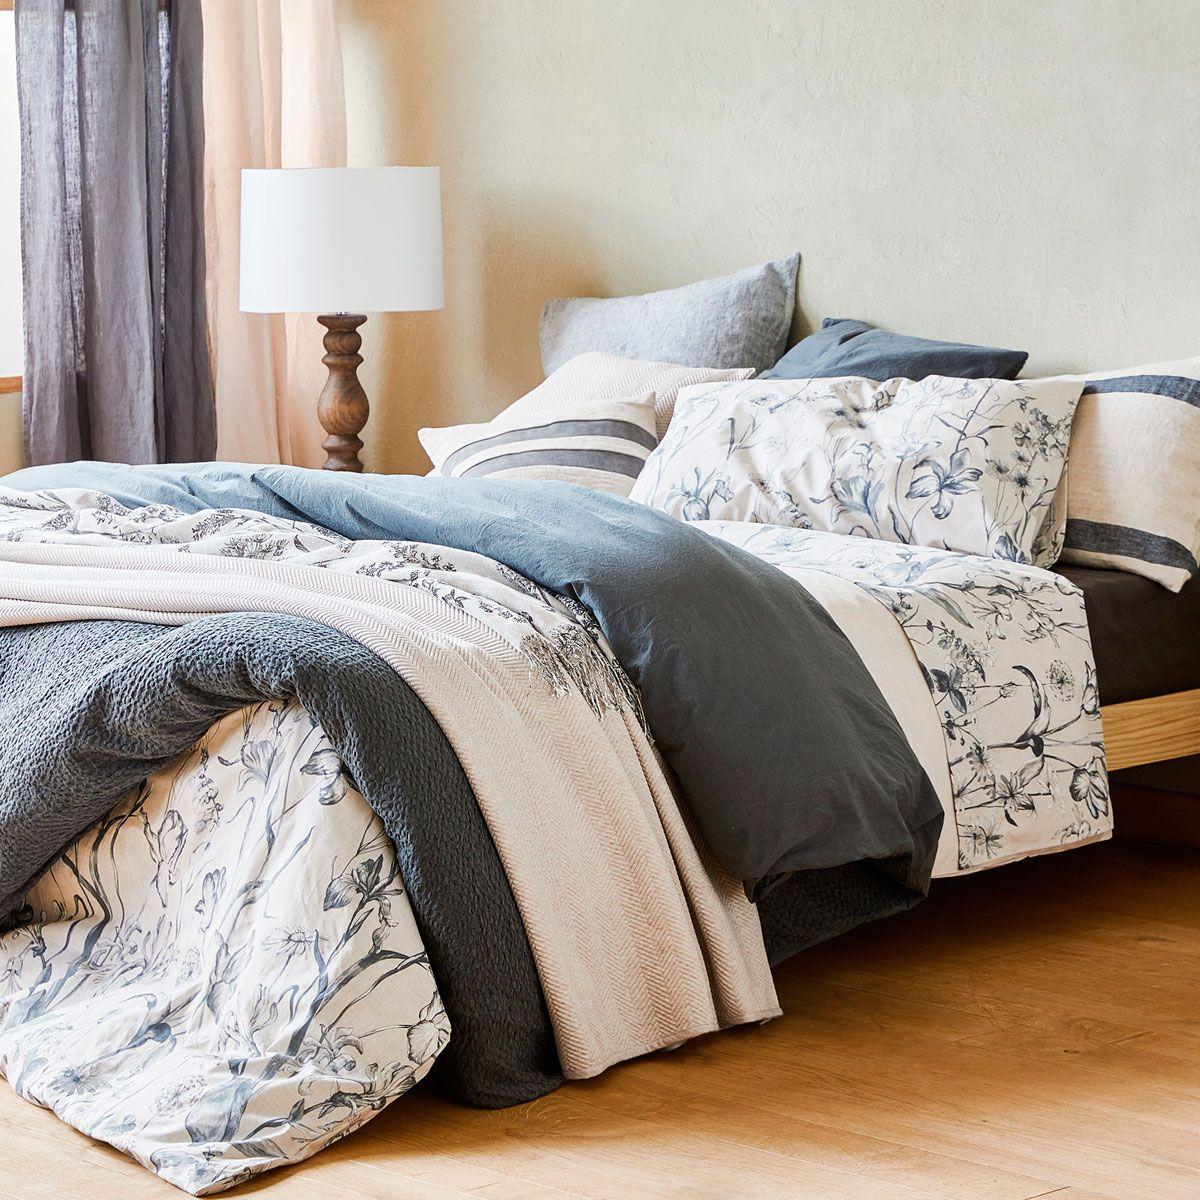 Zara Home 09 17 Bedding Pinterest